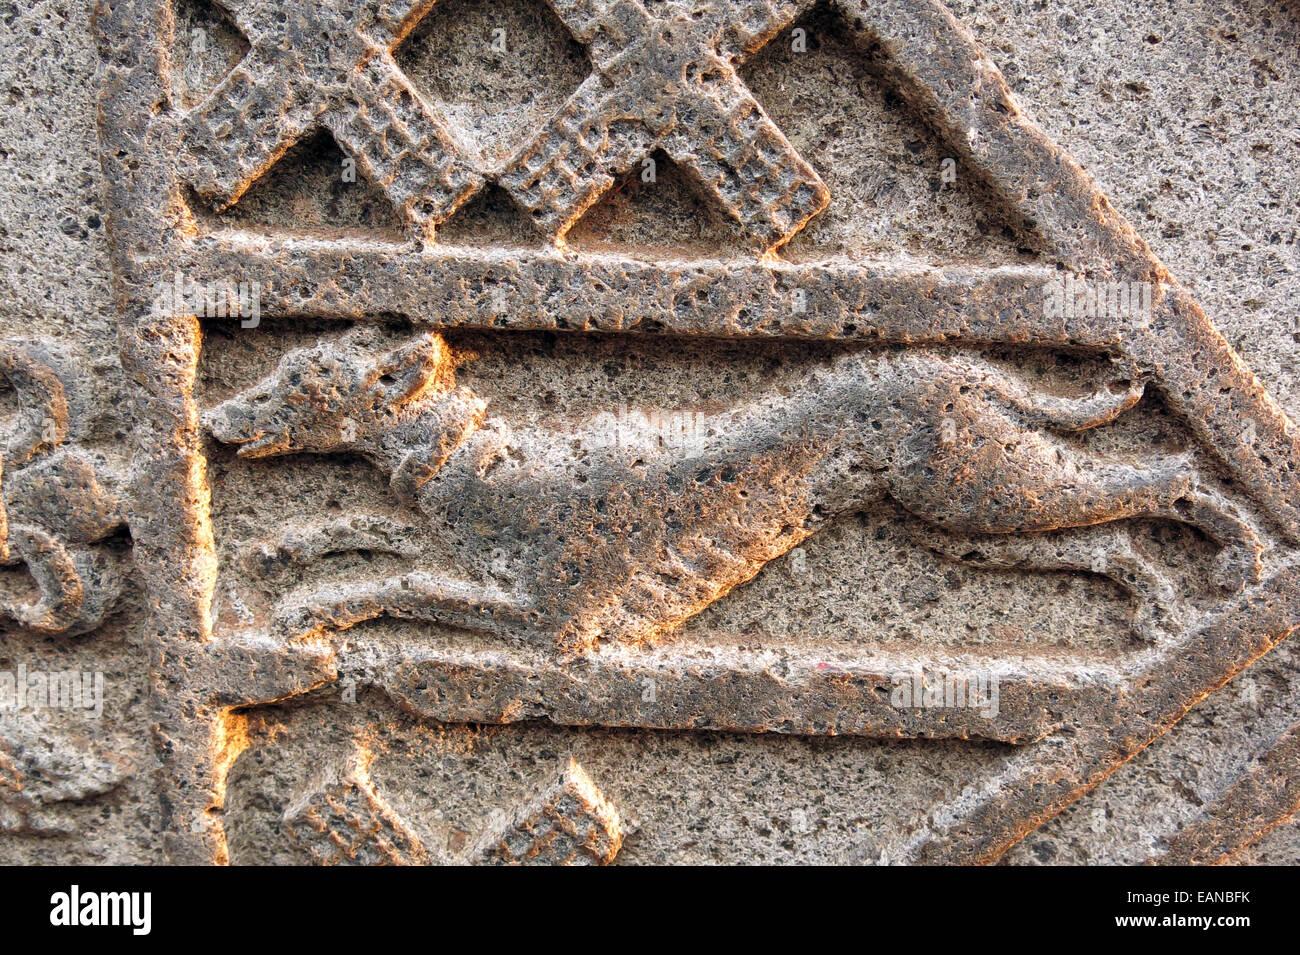 Polonnaruwa greyhound dog motif on ruins - Stock Image